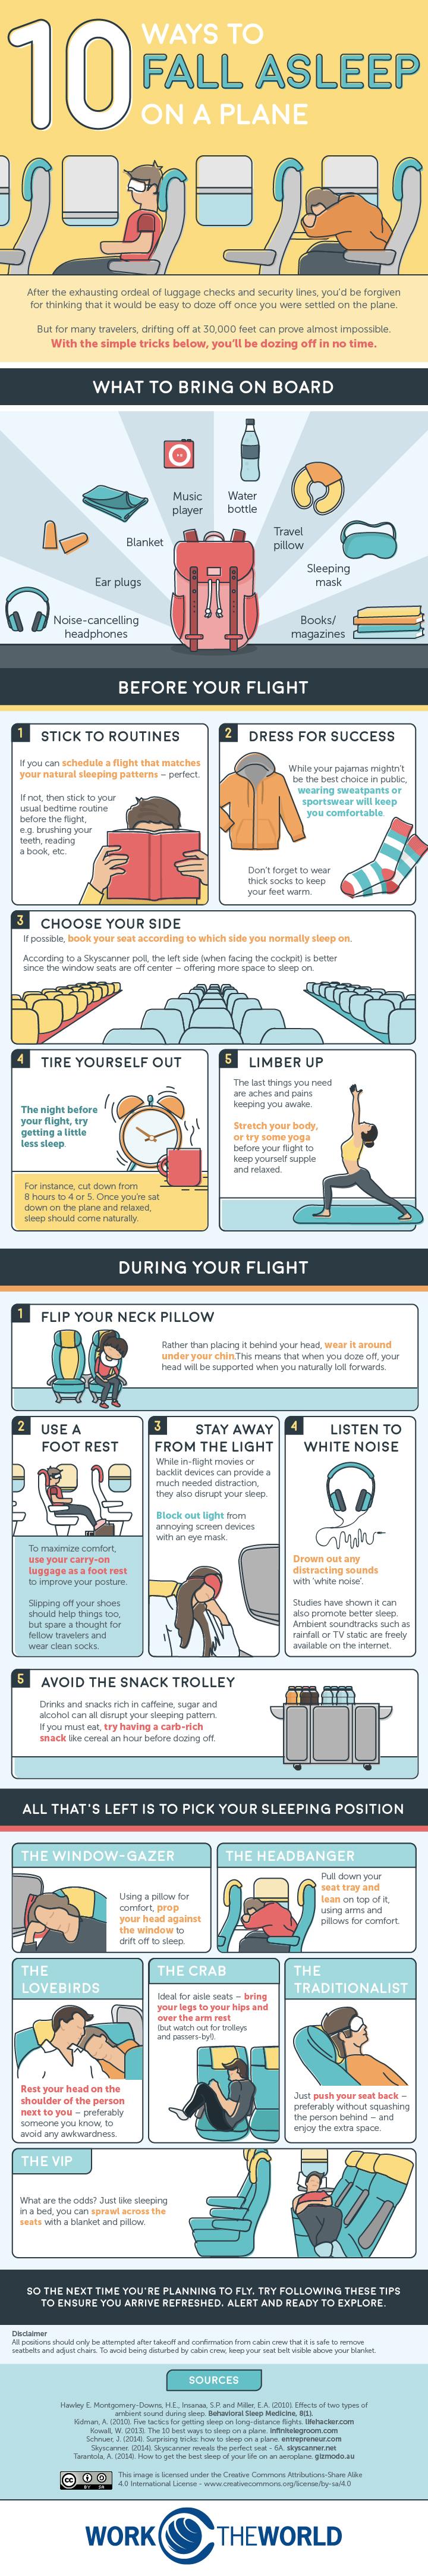 10 Methods to Help You Sleep Comfortably on a Plane - Infographic